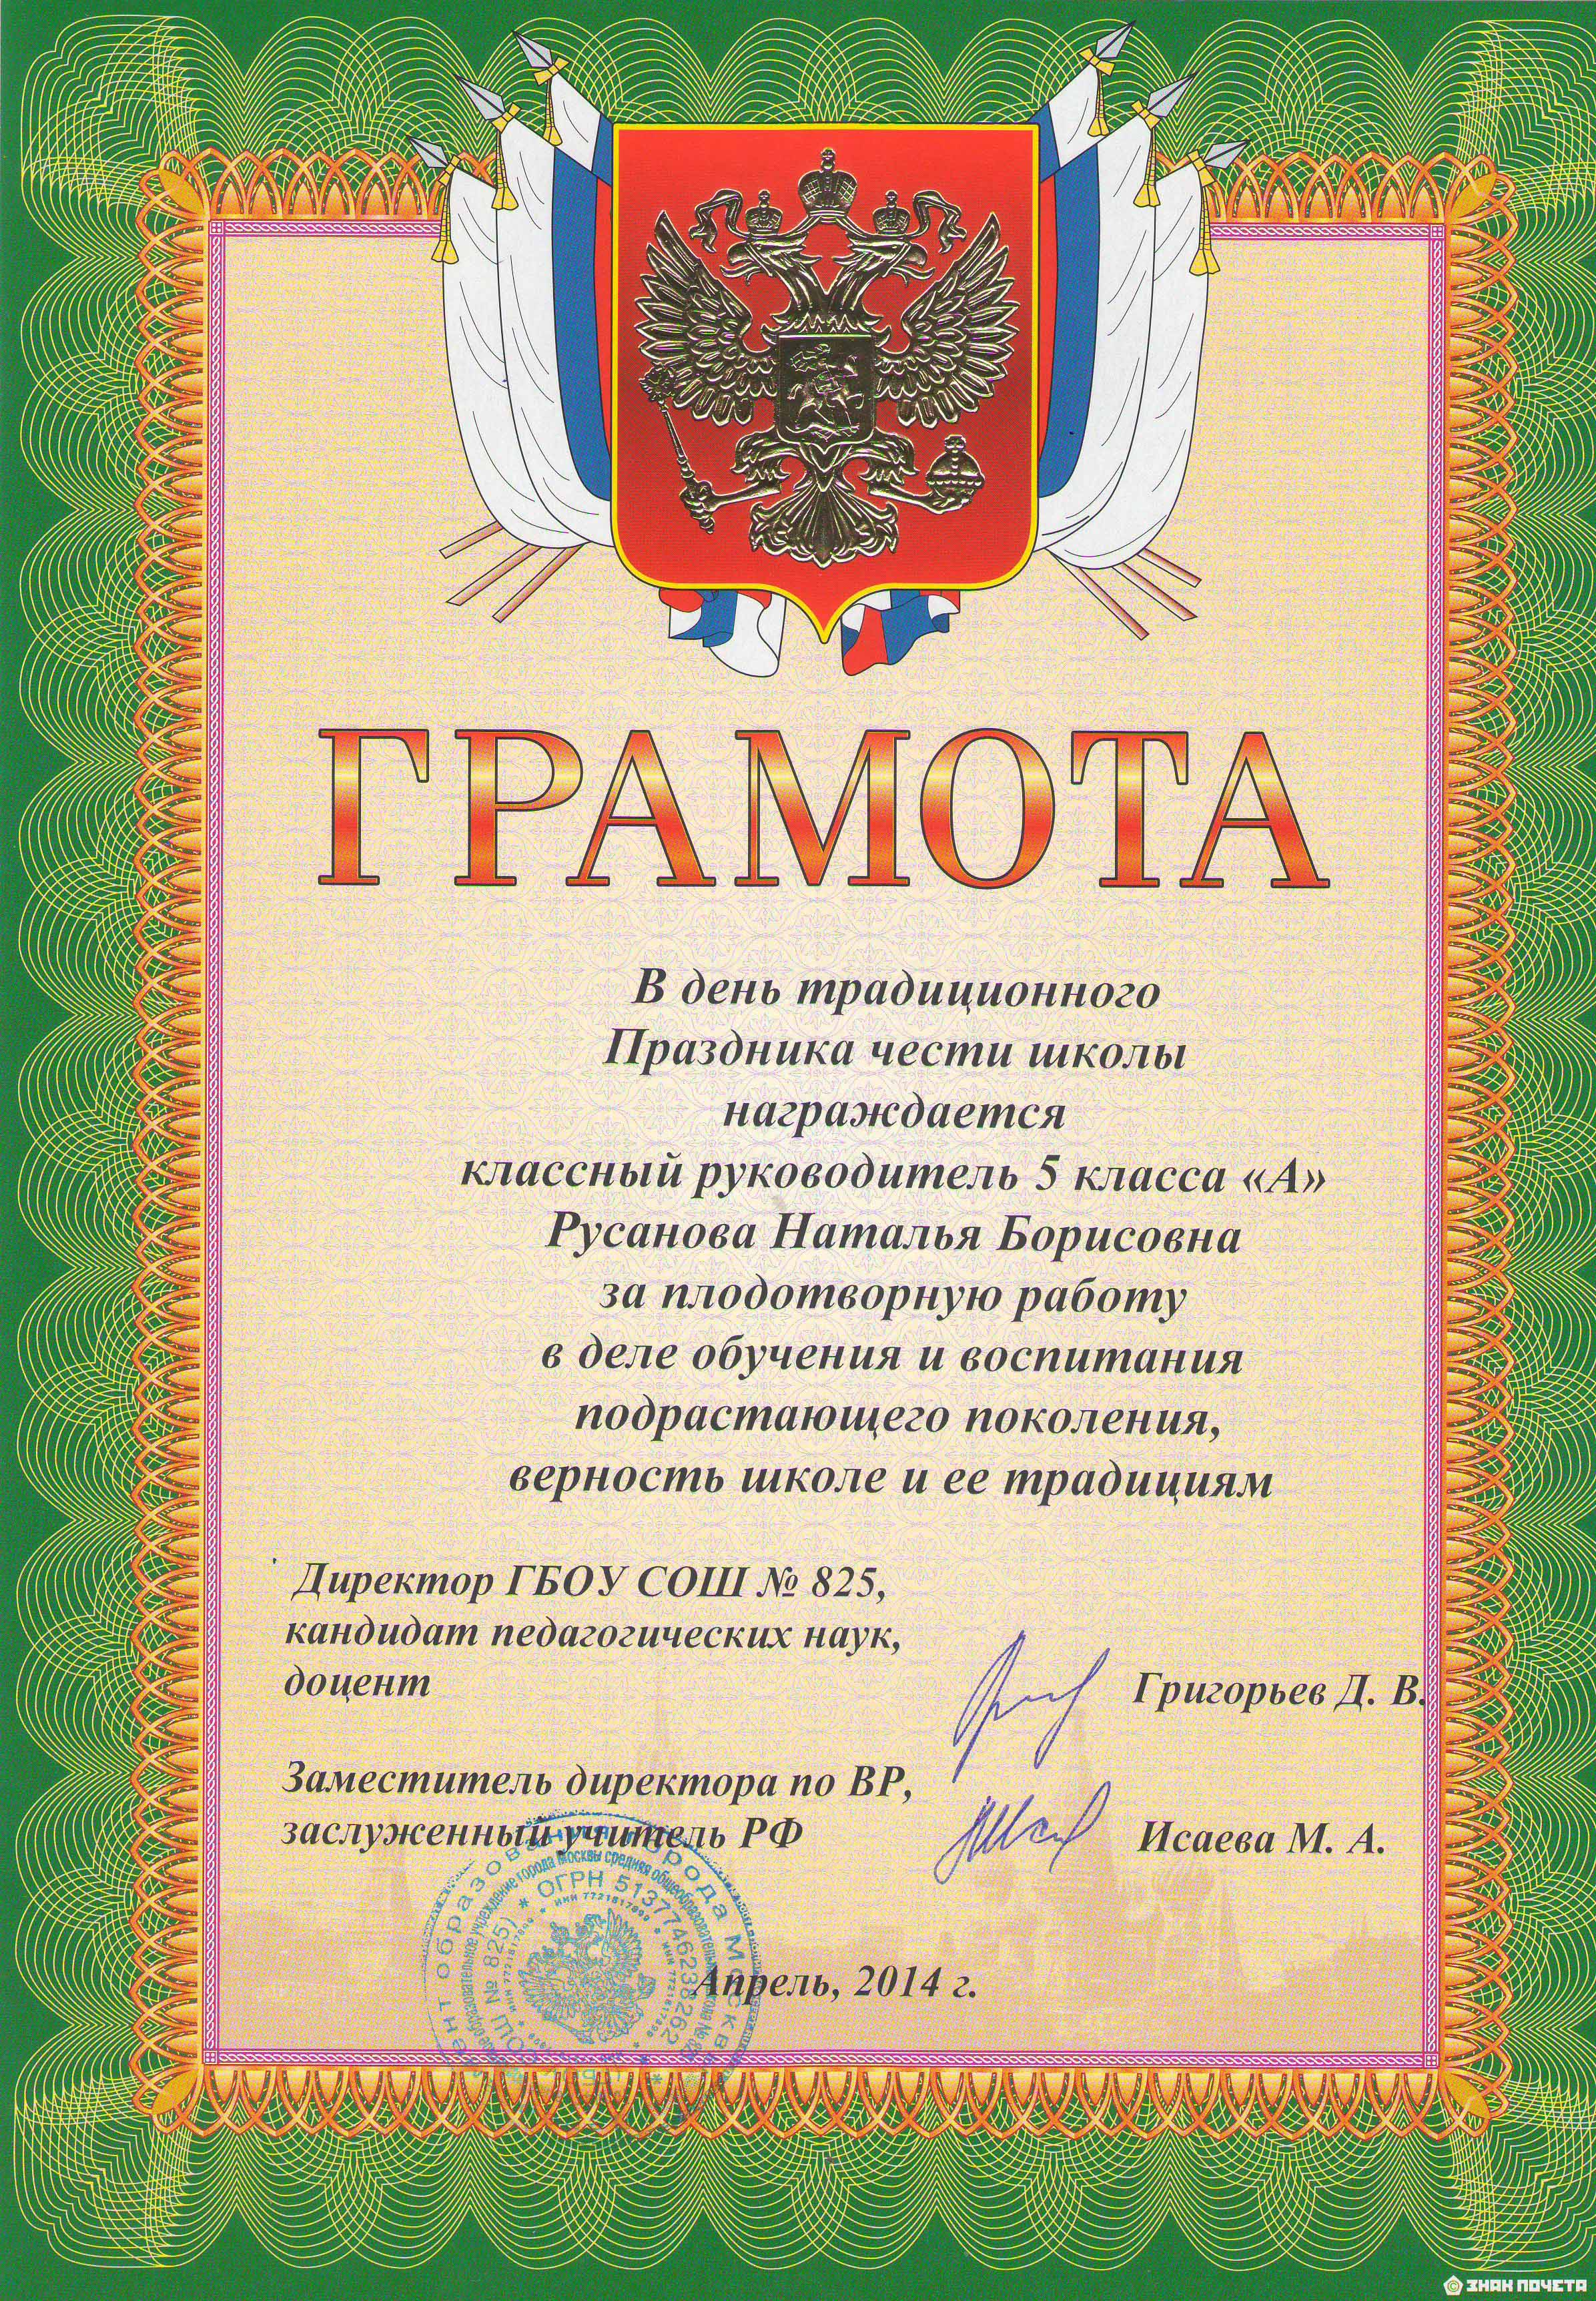 gramota-2014-2-